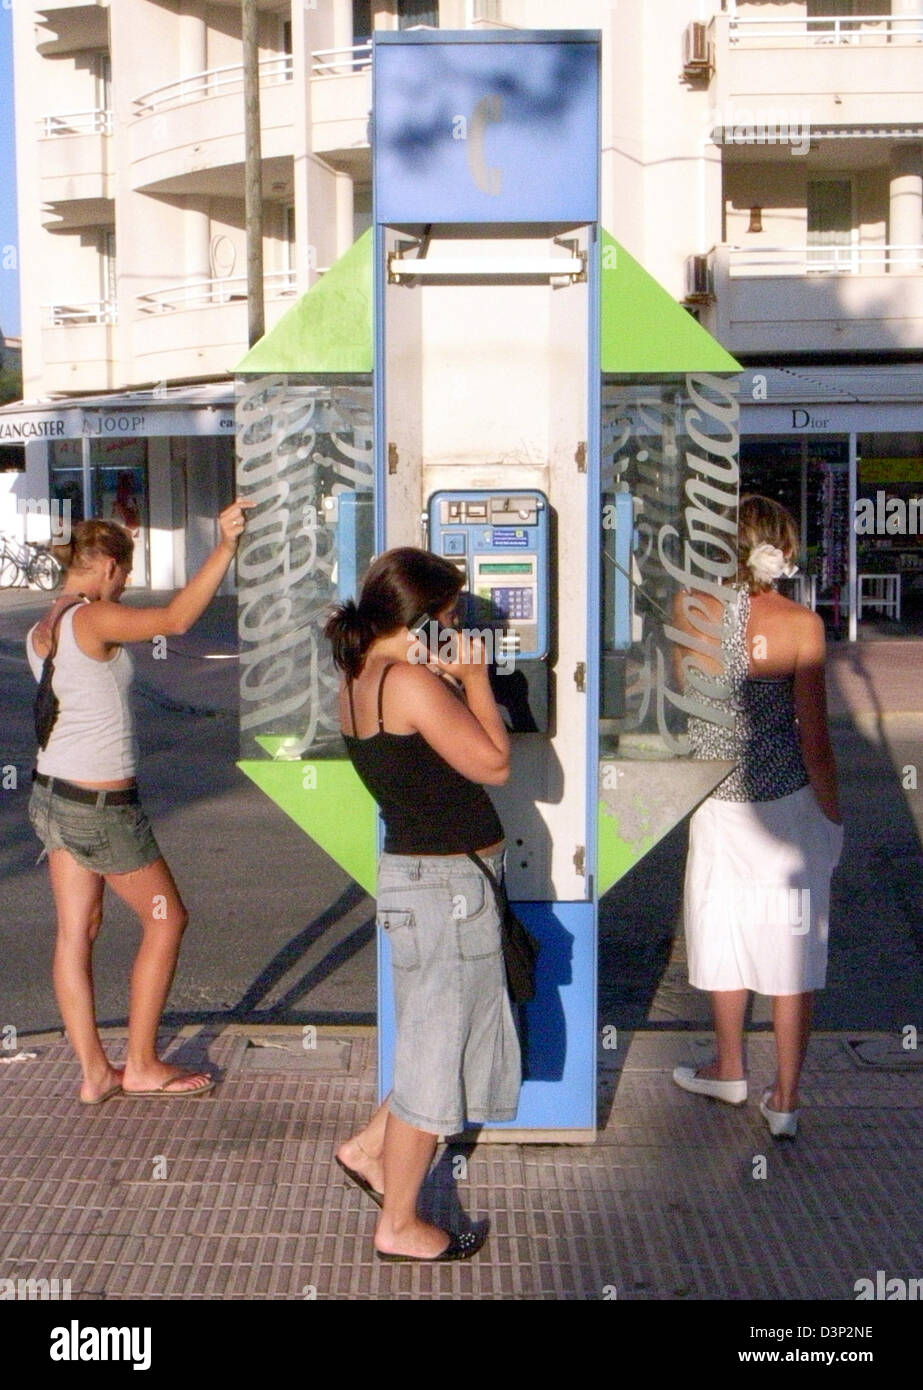 Women talk on public phones by telecommunication company telefonica in Cala Ratjada on Mallorca, Spain, Tuesday - Stock Image